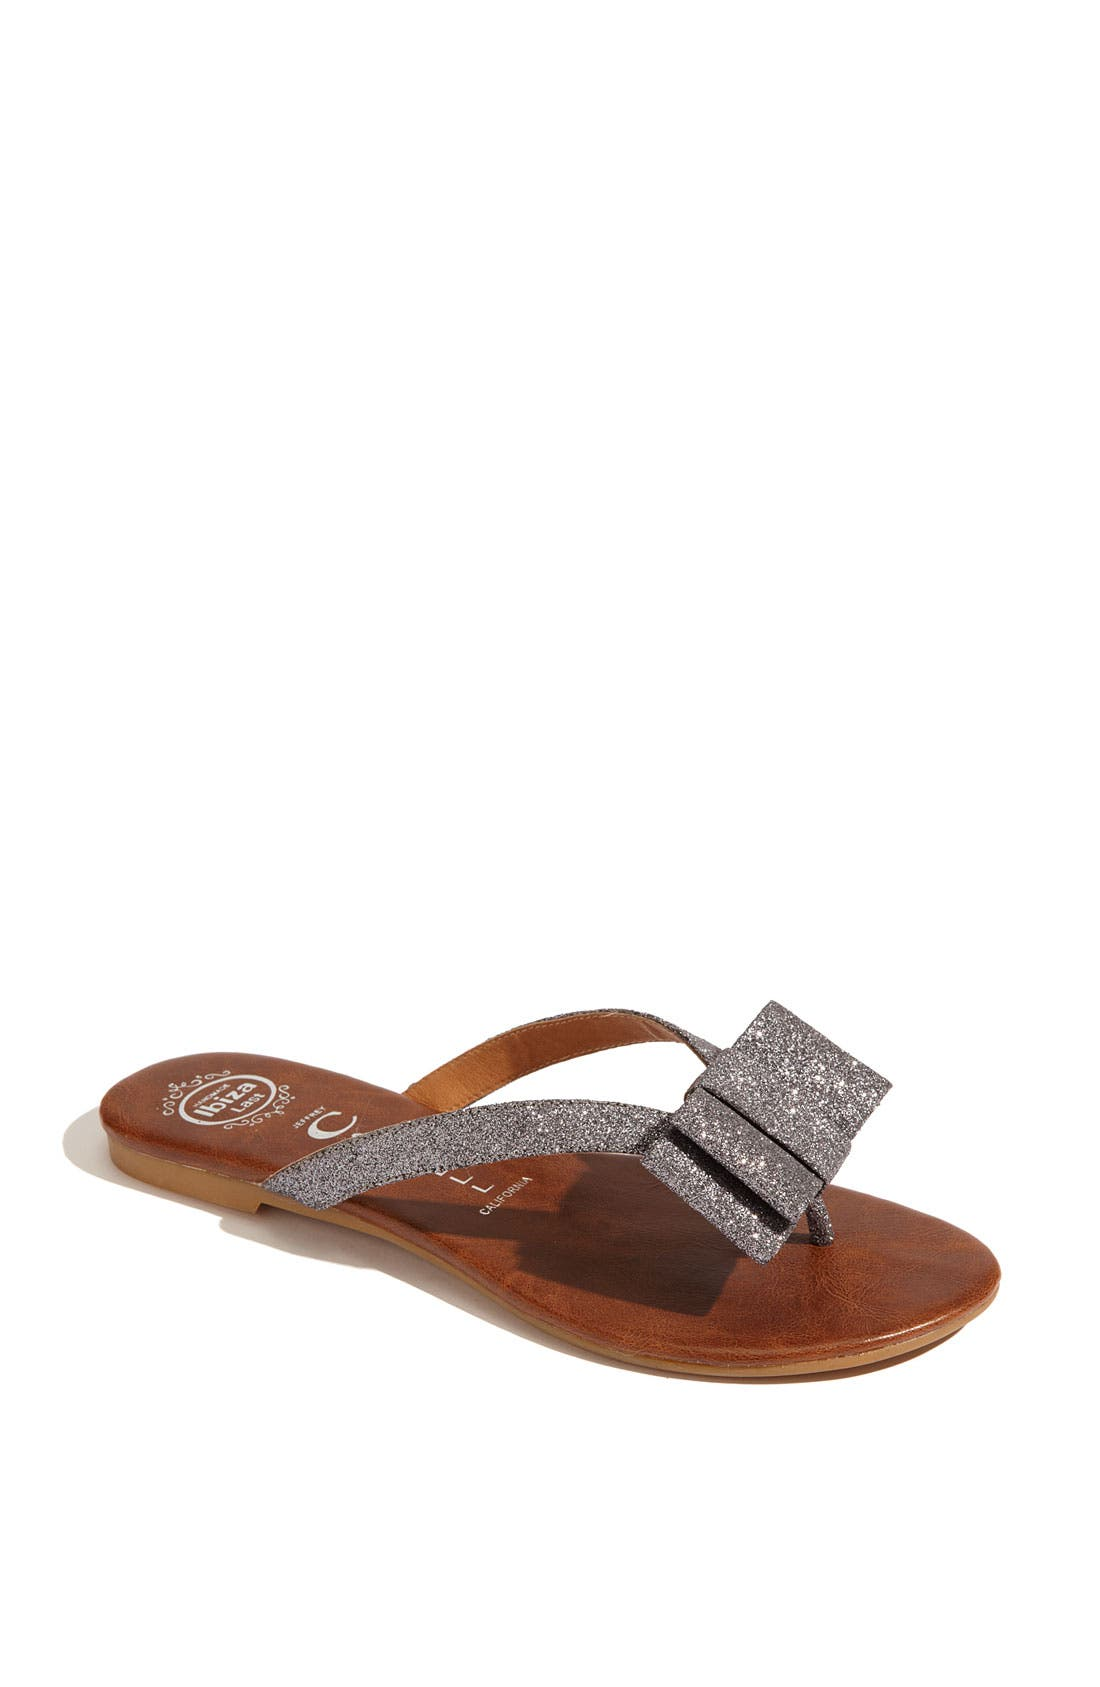 Alternate Image 1 Selected - Jeffrey Campbell 'Esmerald' Glitter Sandal